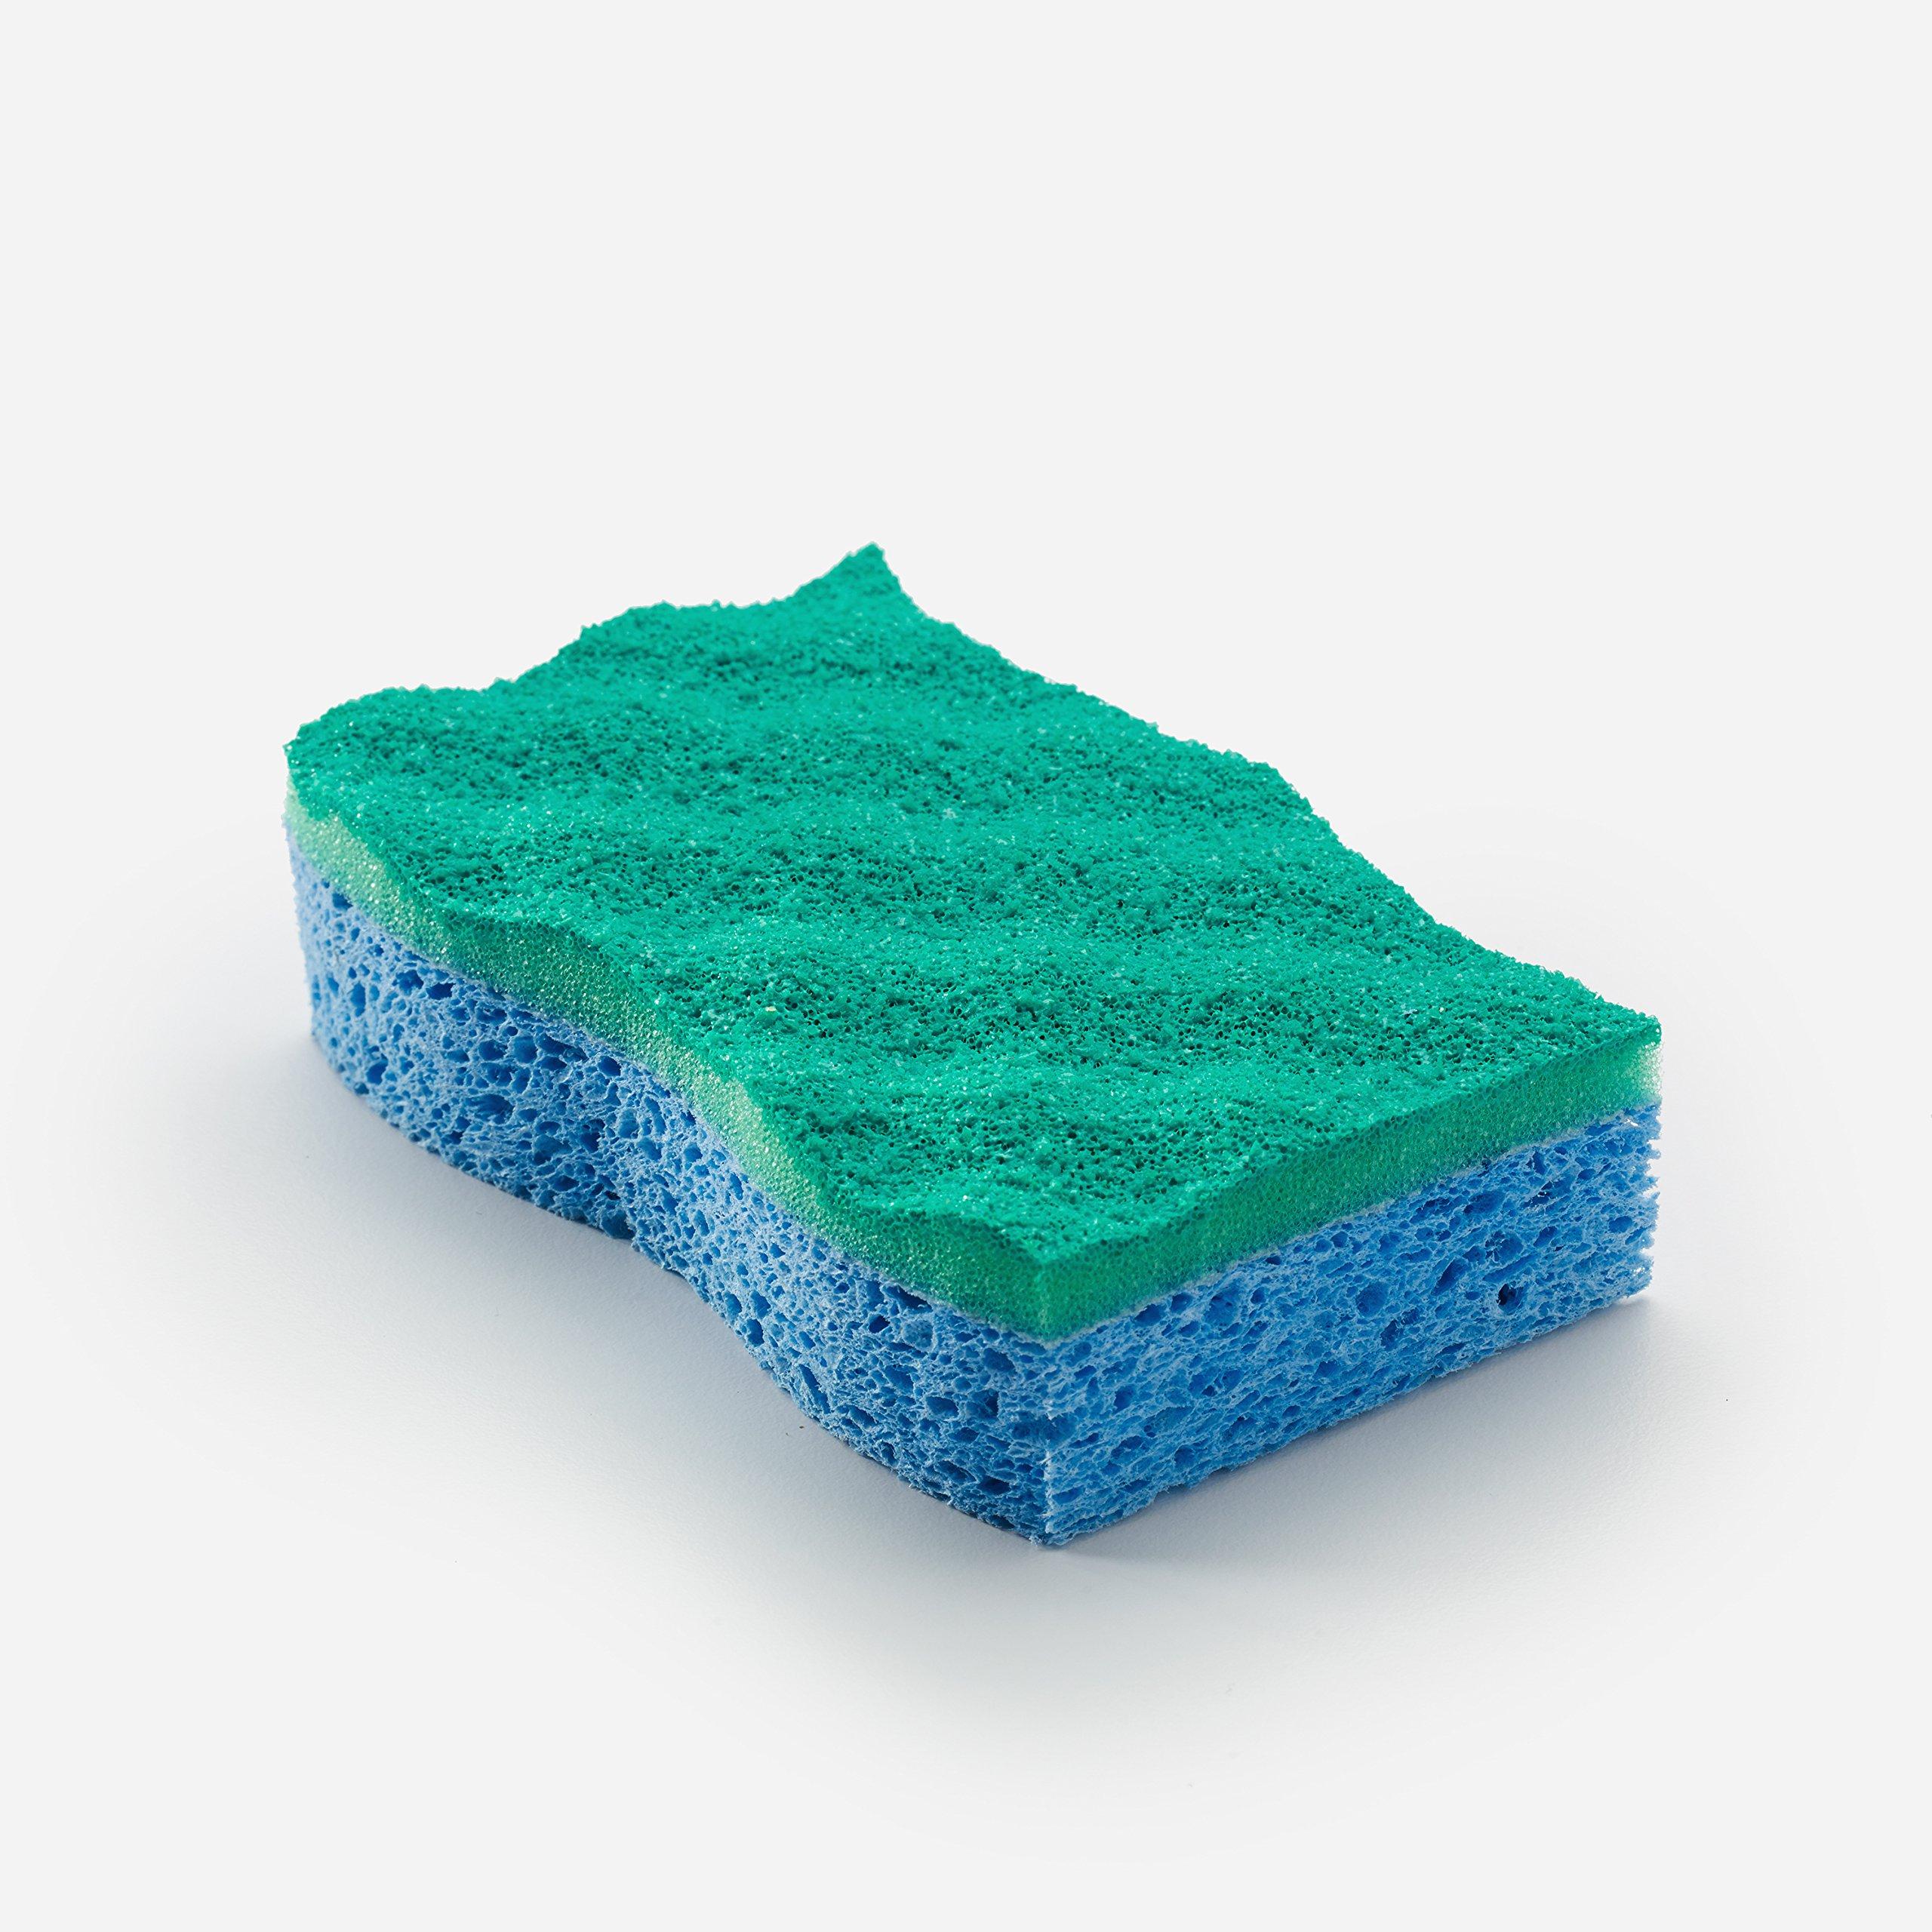 O-Cedar Multi-Use Scrunge Scrubber Sponge (Pack of 24) by O-Cedar (Image #2)